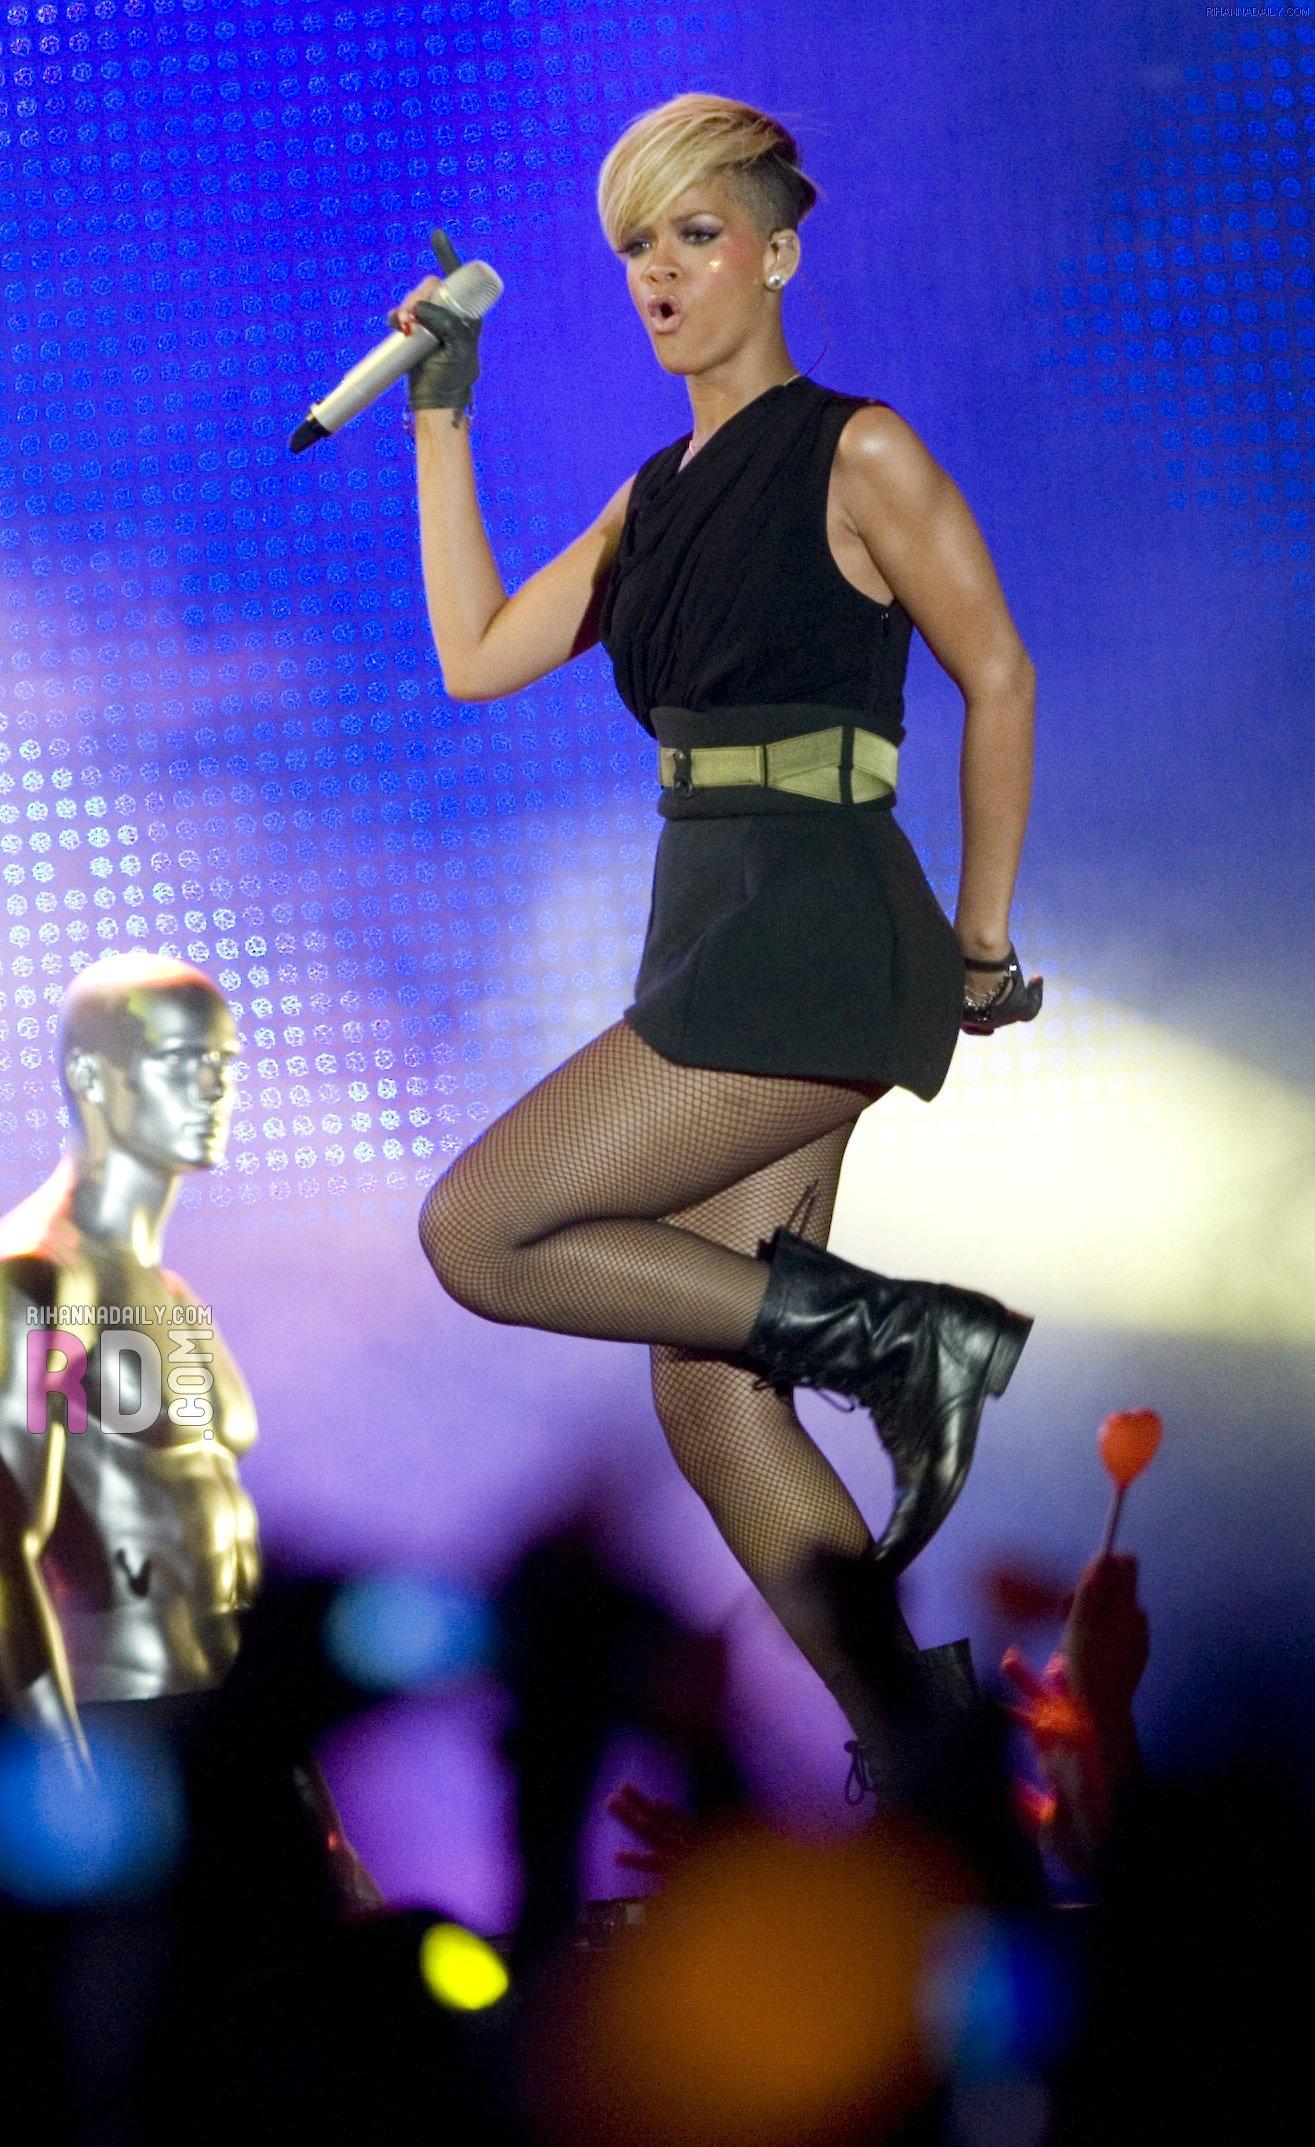 Rihanna 2010 : rihanna-performance-pics-in-tel-aviv-may-2010-06